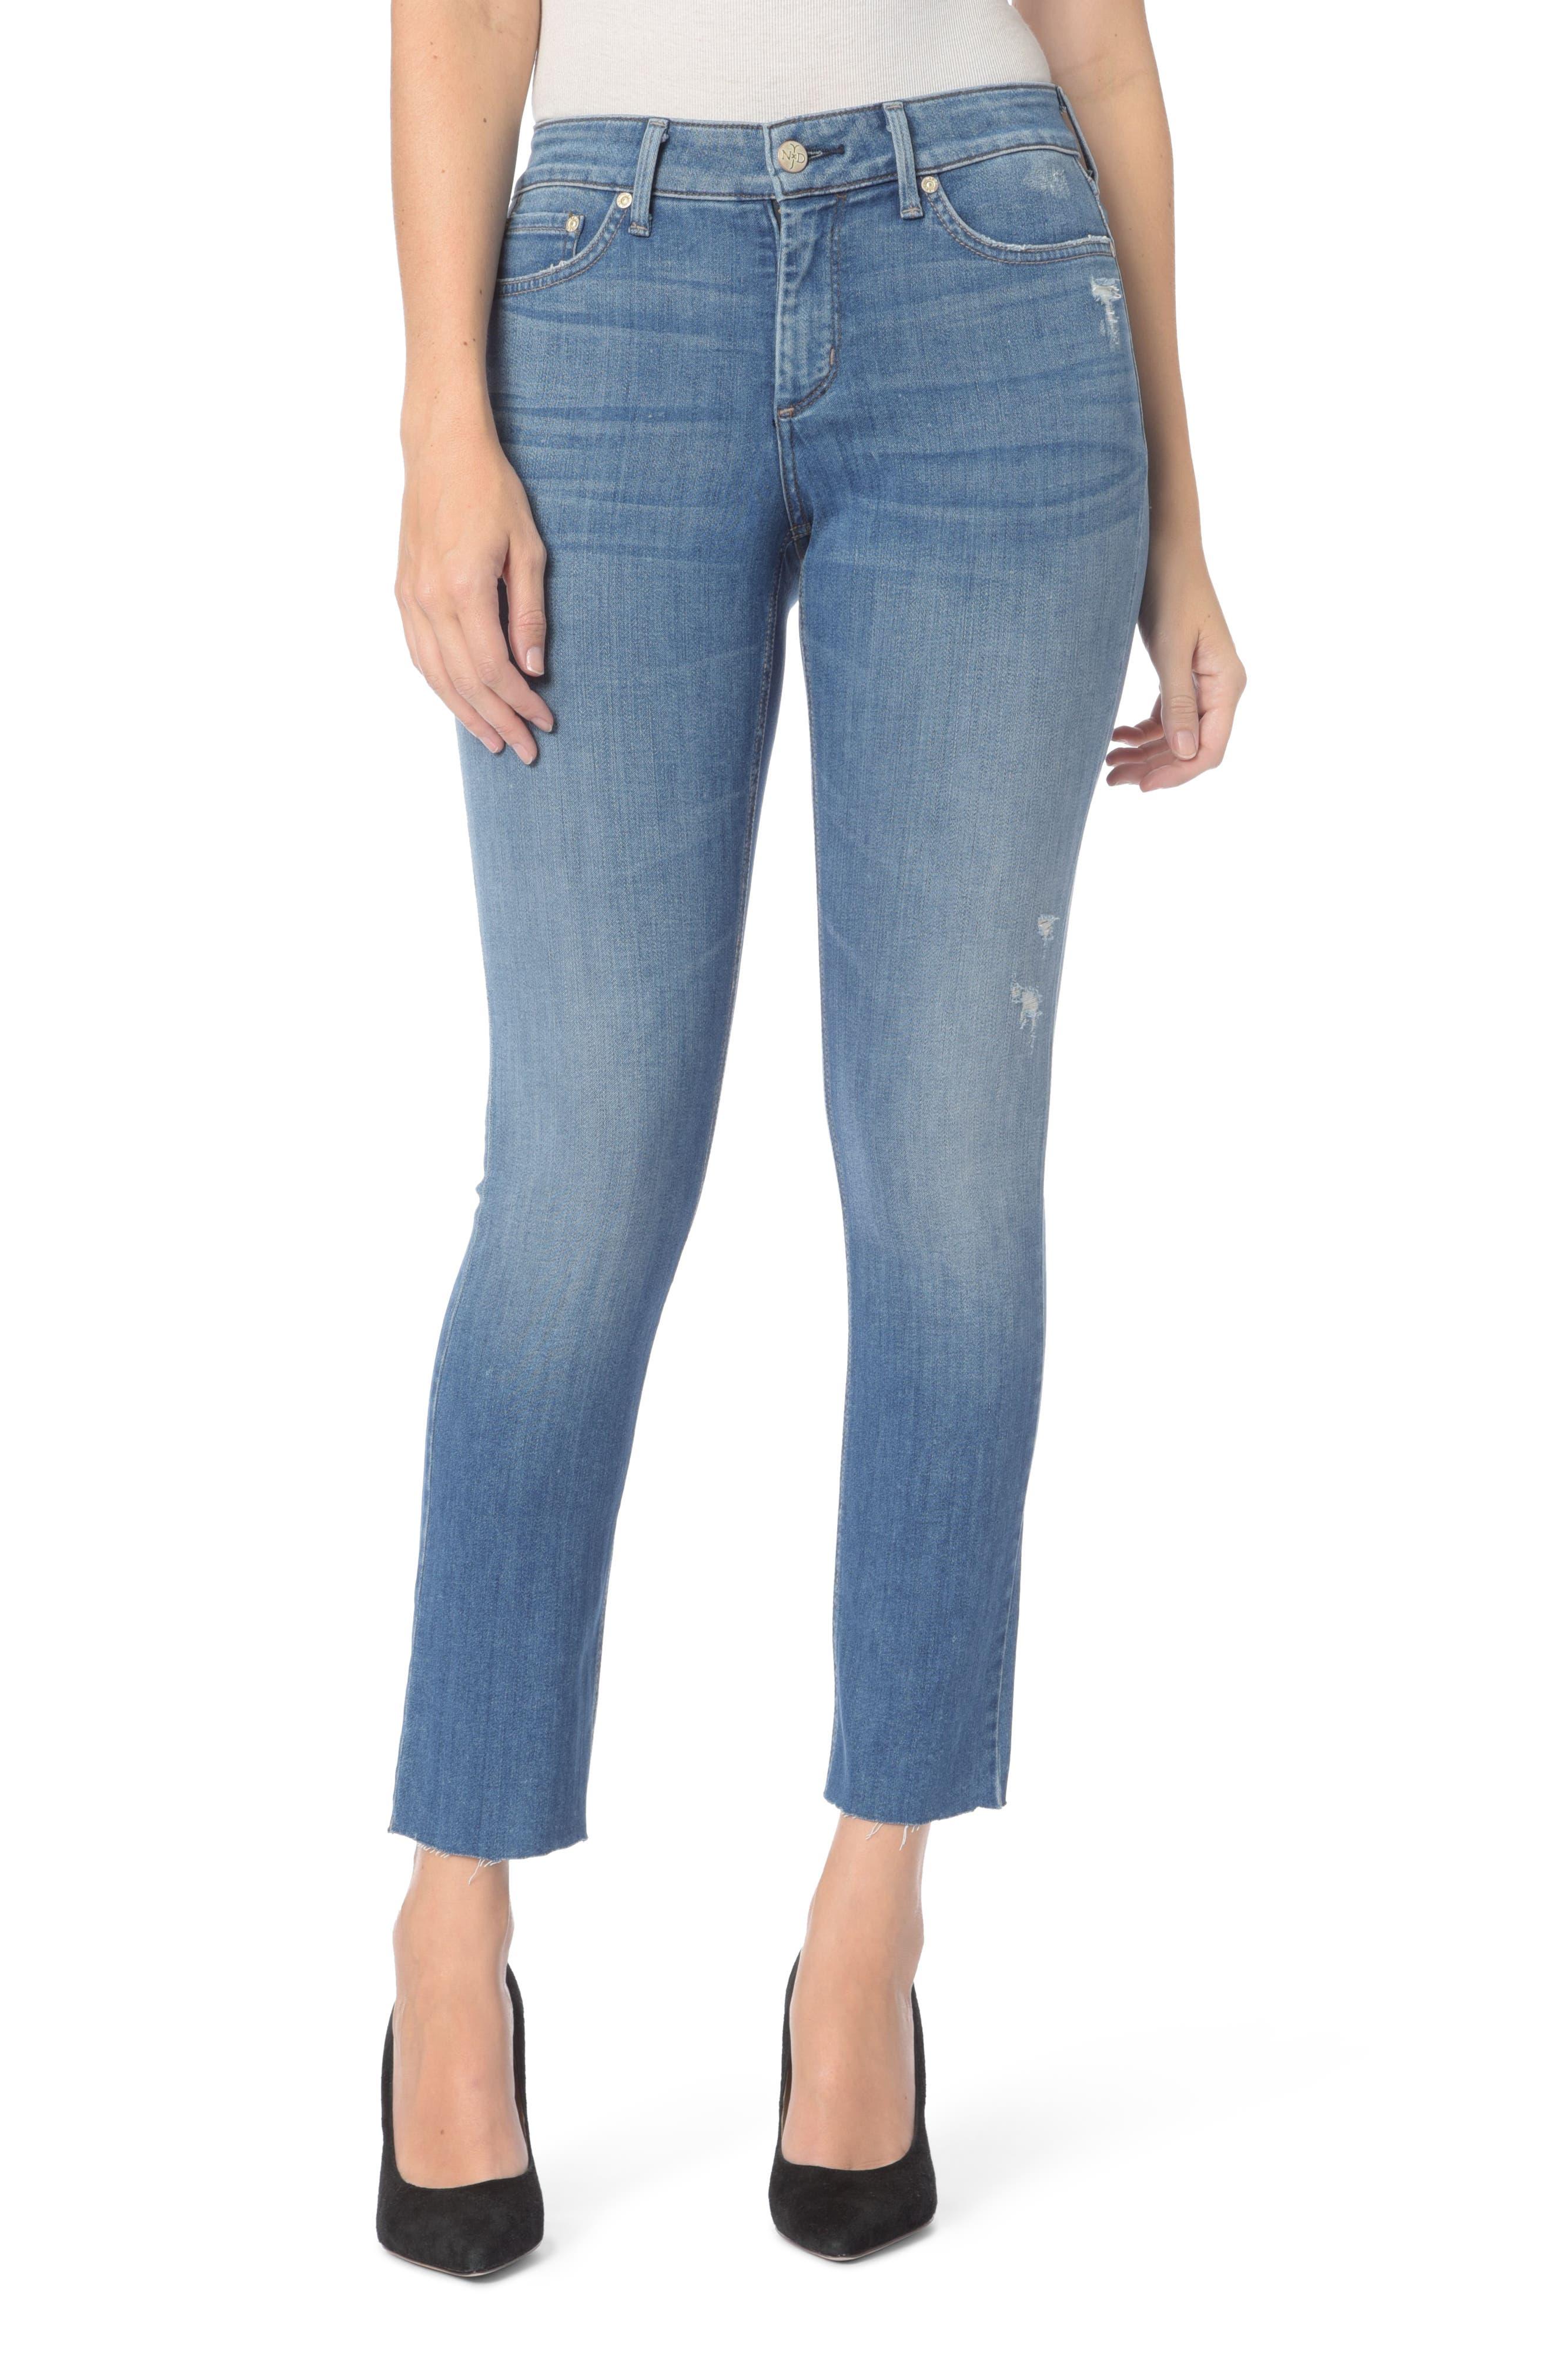 Main Image - NYDJ Sheri Ripped Slim Stretch Ankle Jeans (Burton)